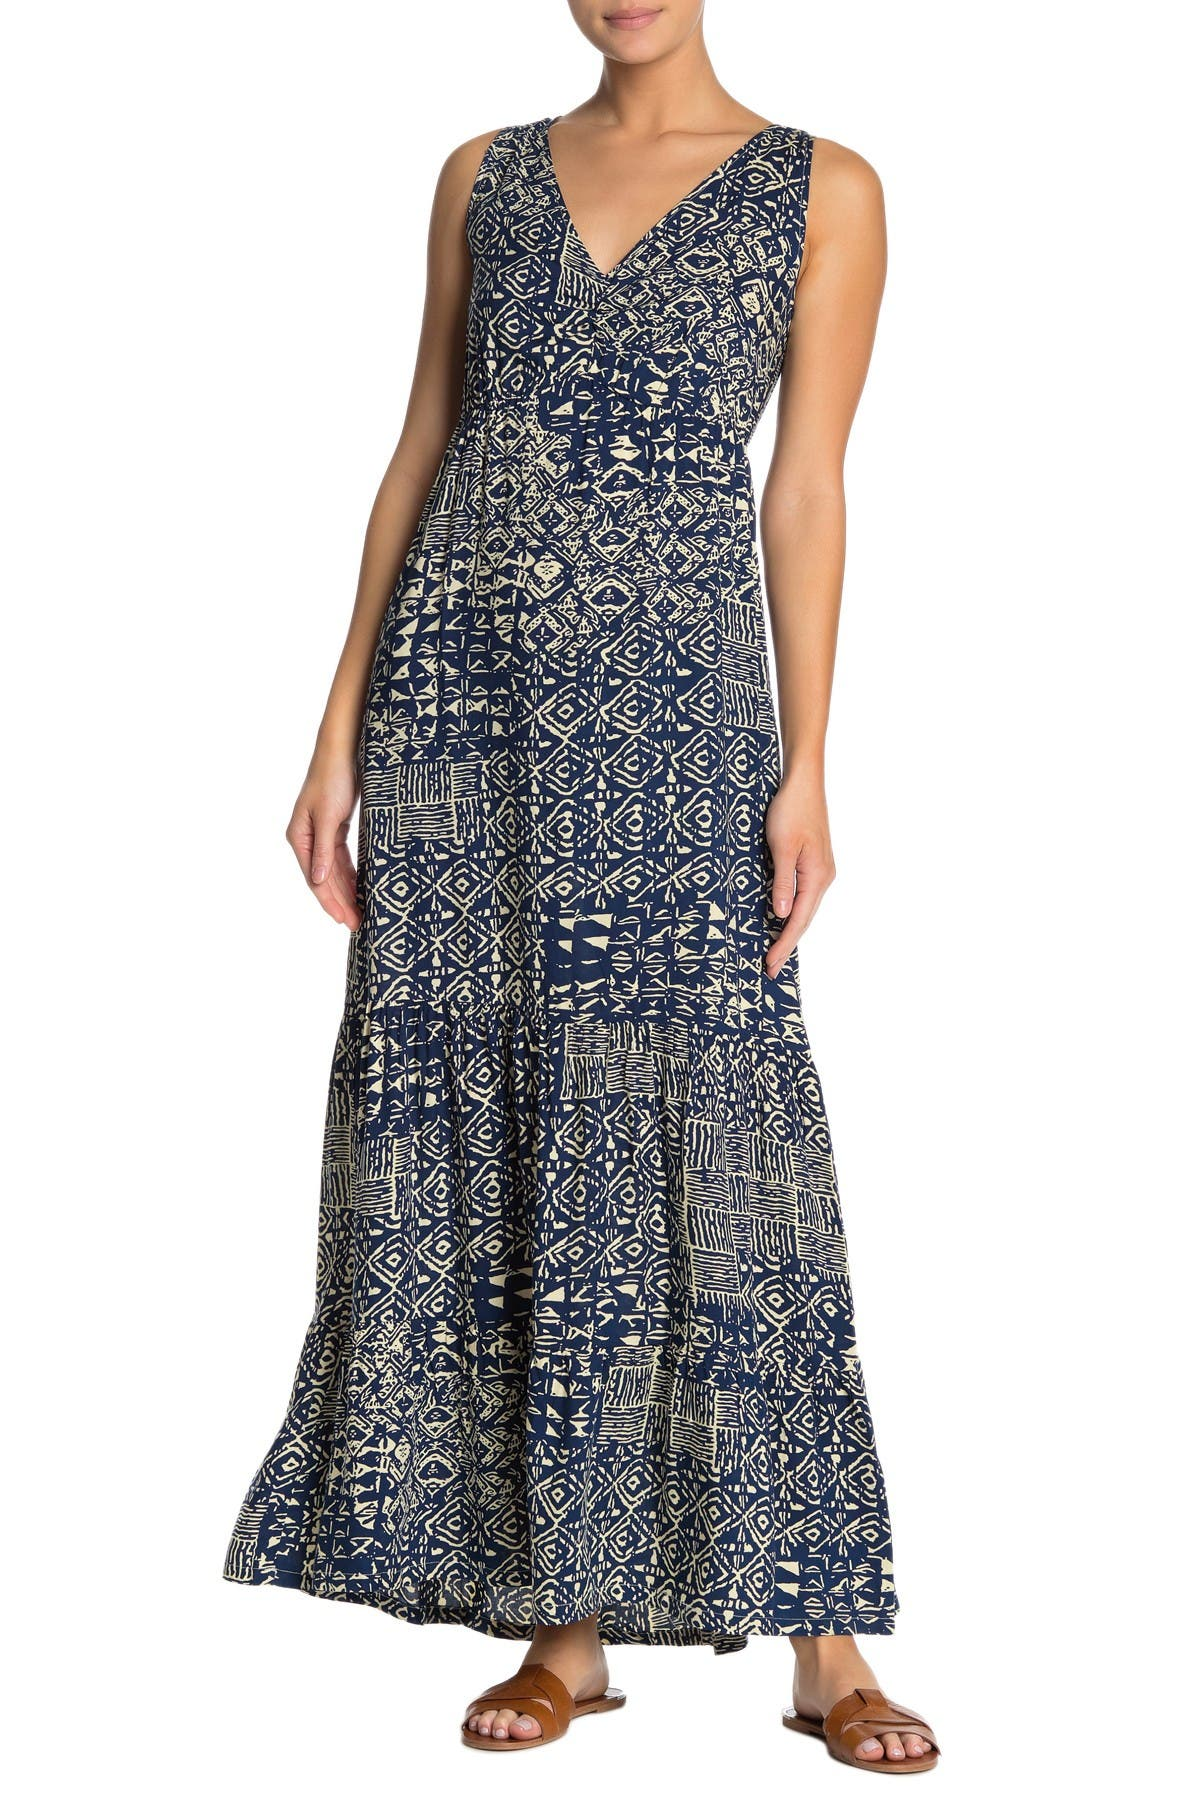 Image of Papillon Printed Maxi Dress